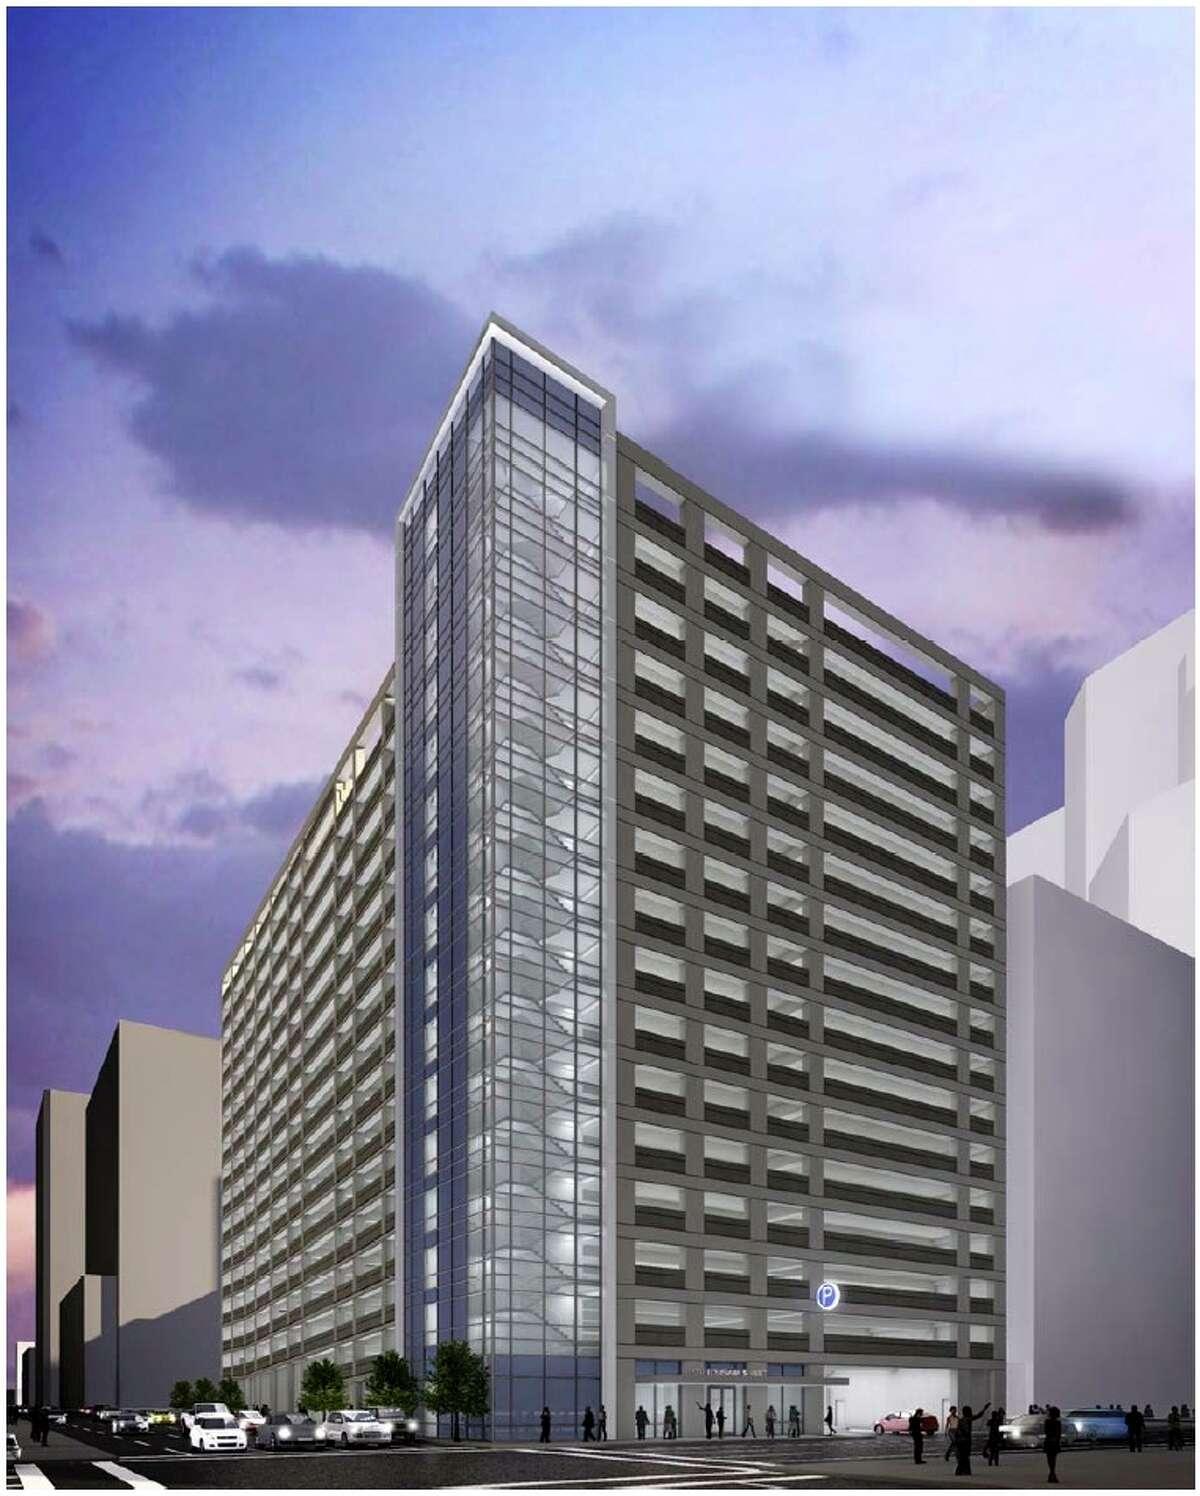 rendering of downtown parking garage